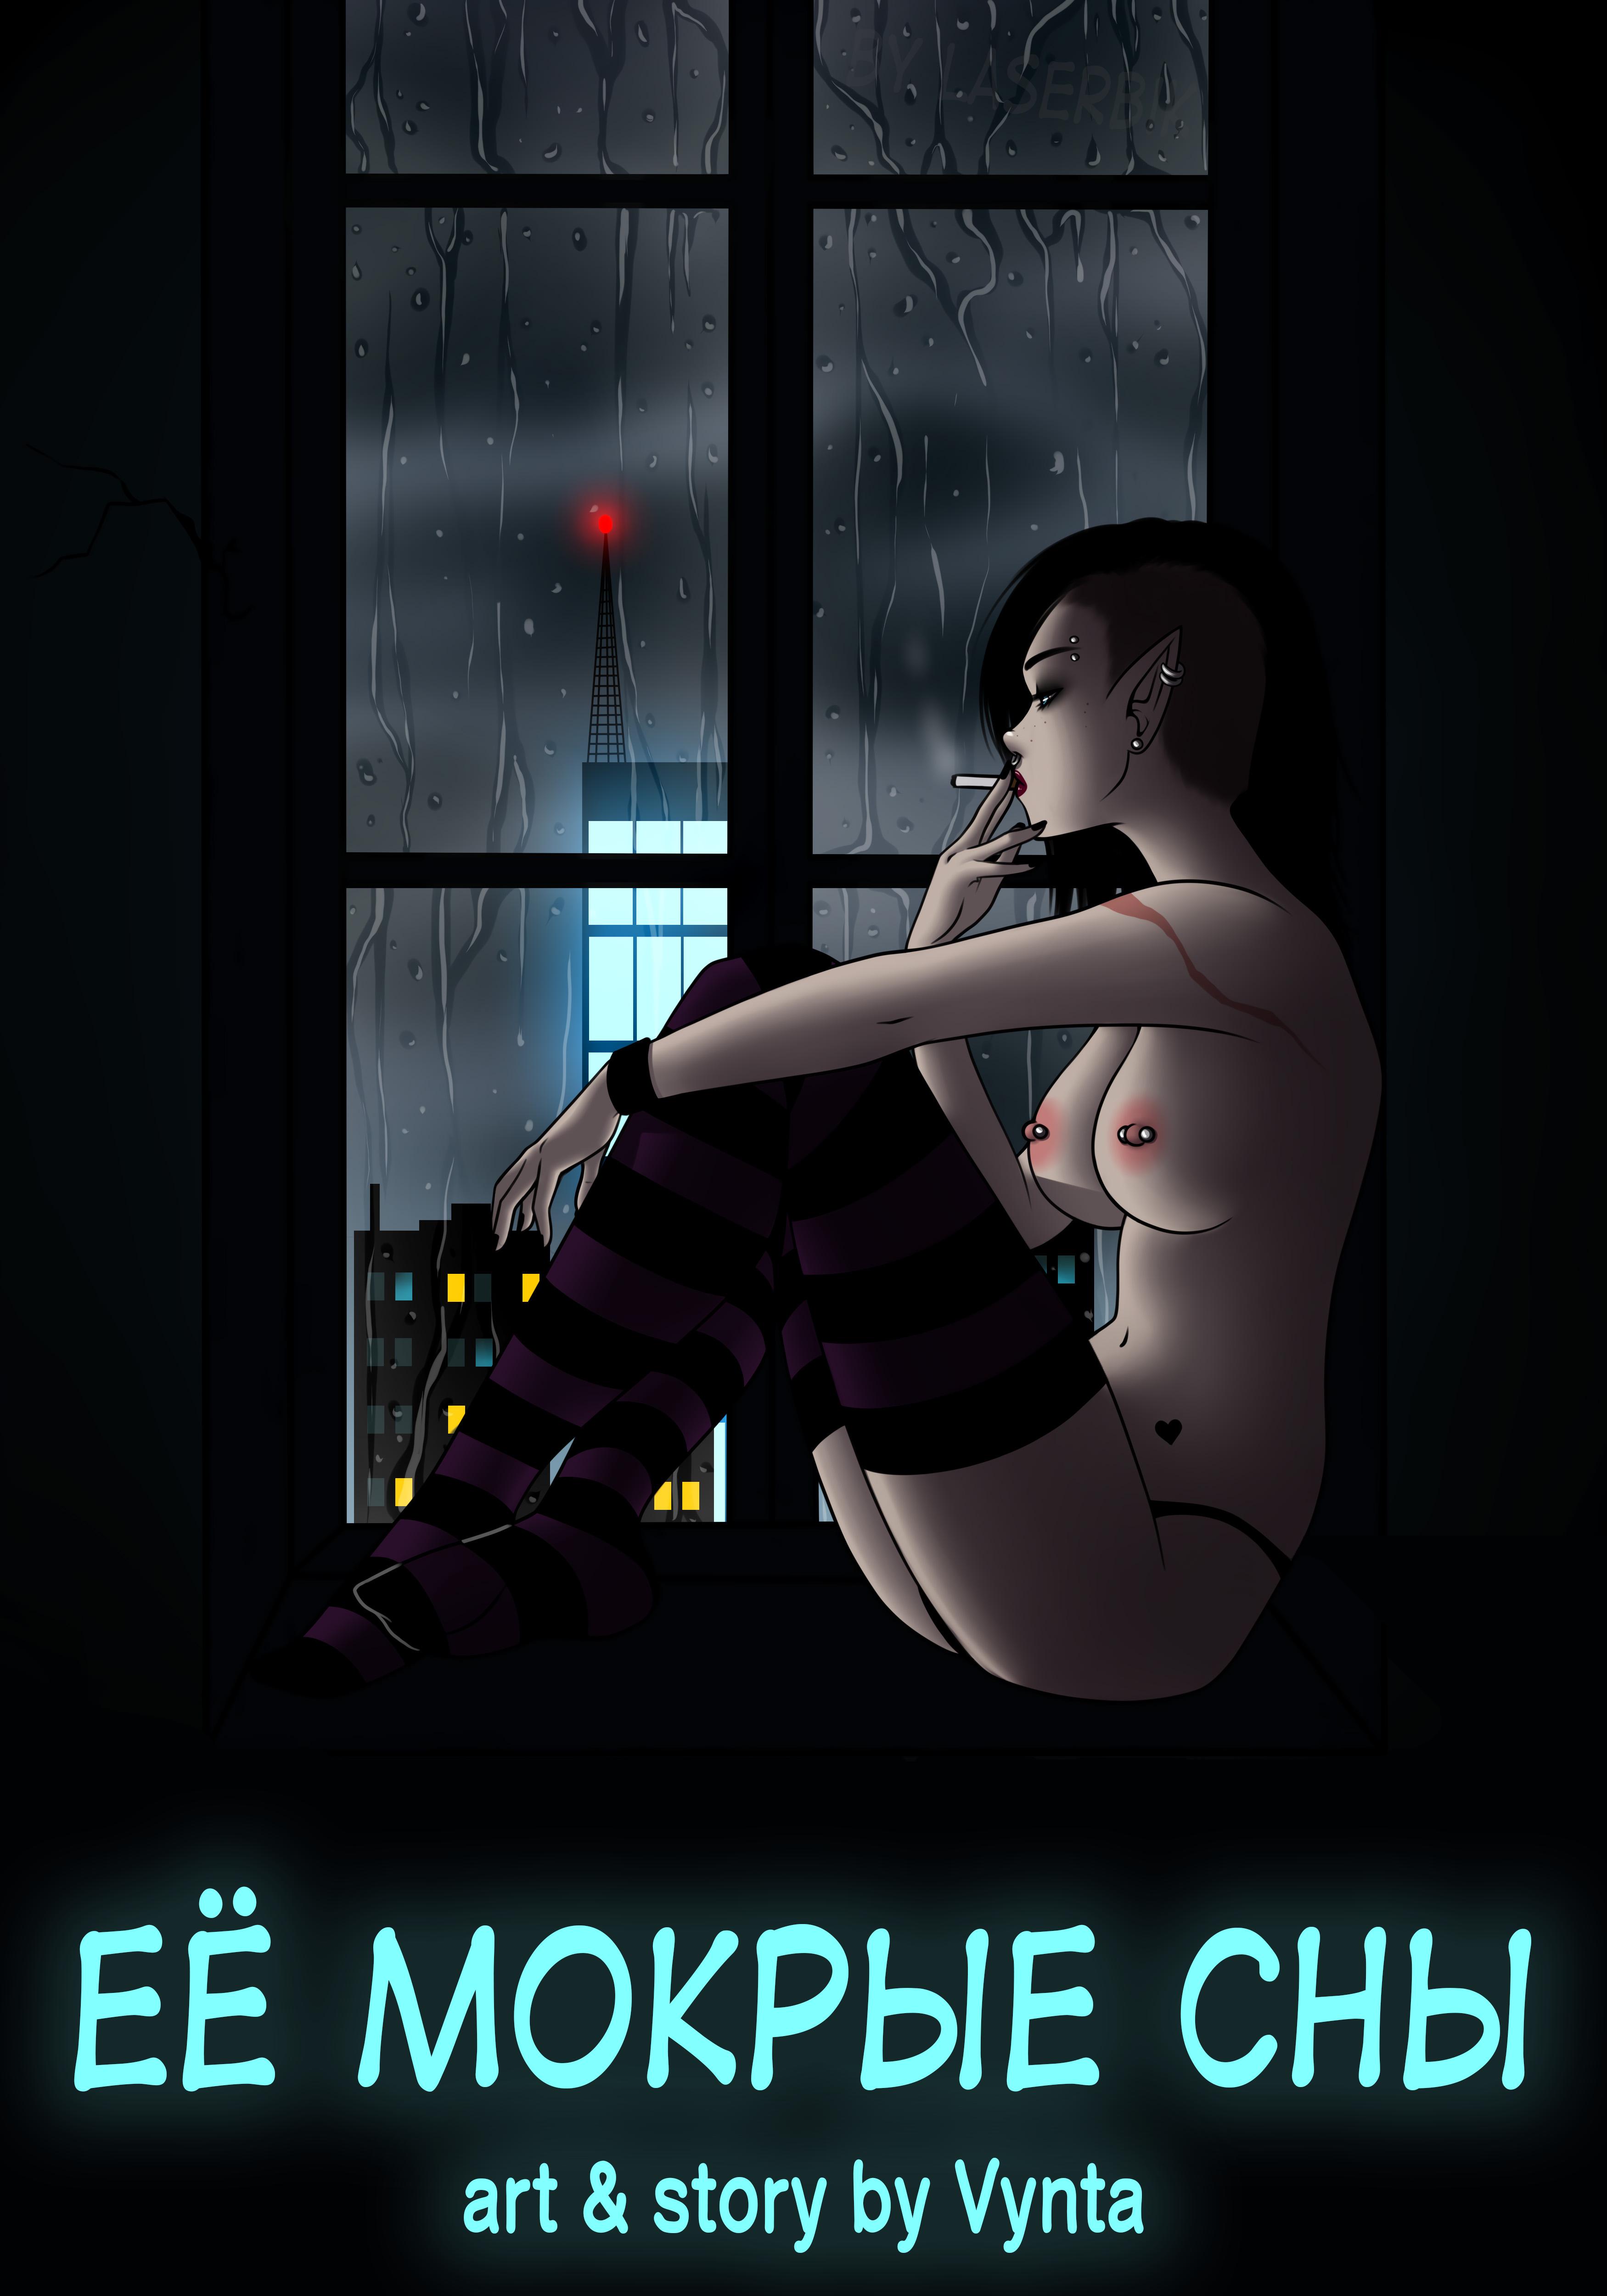 Секс комиксы - Her wet dreams Без цензуры